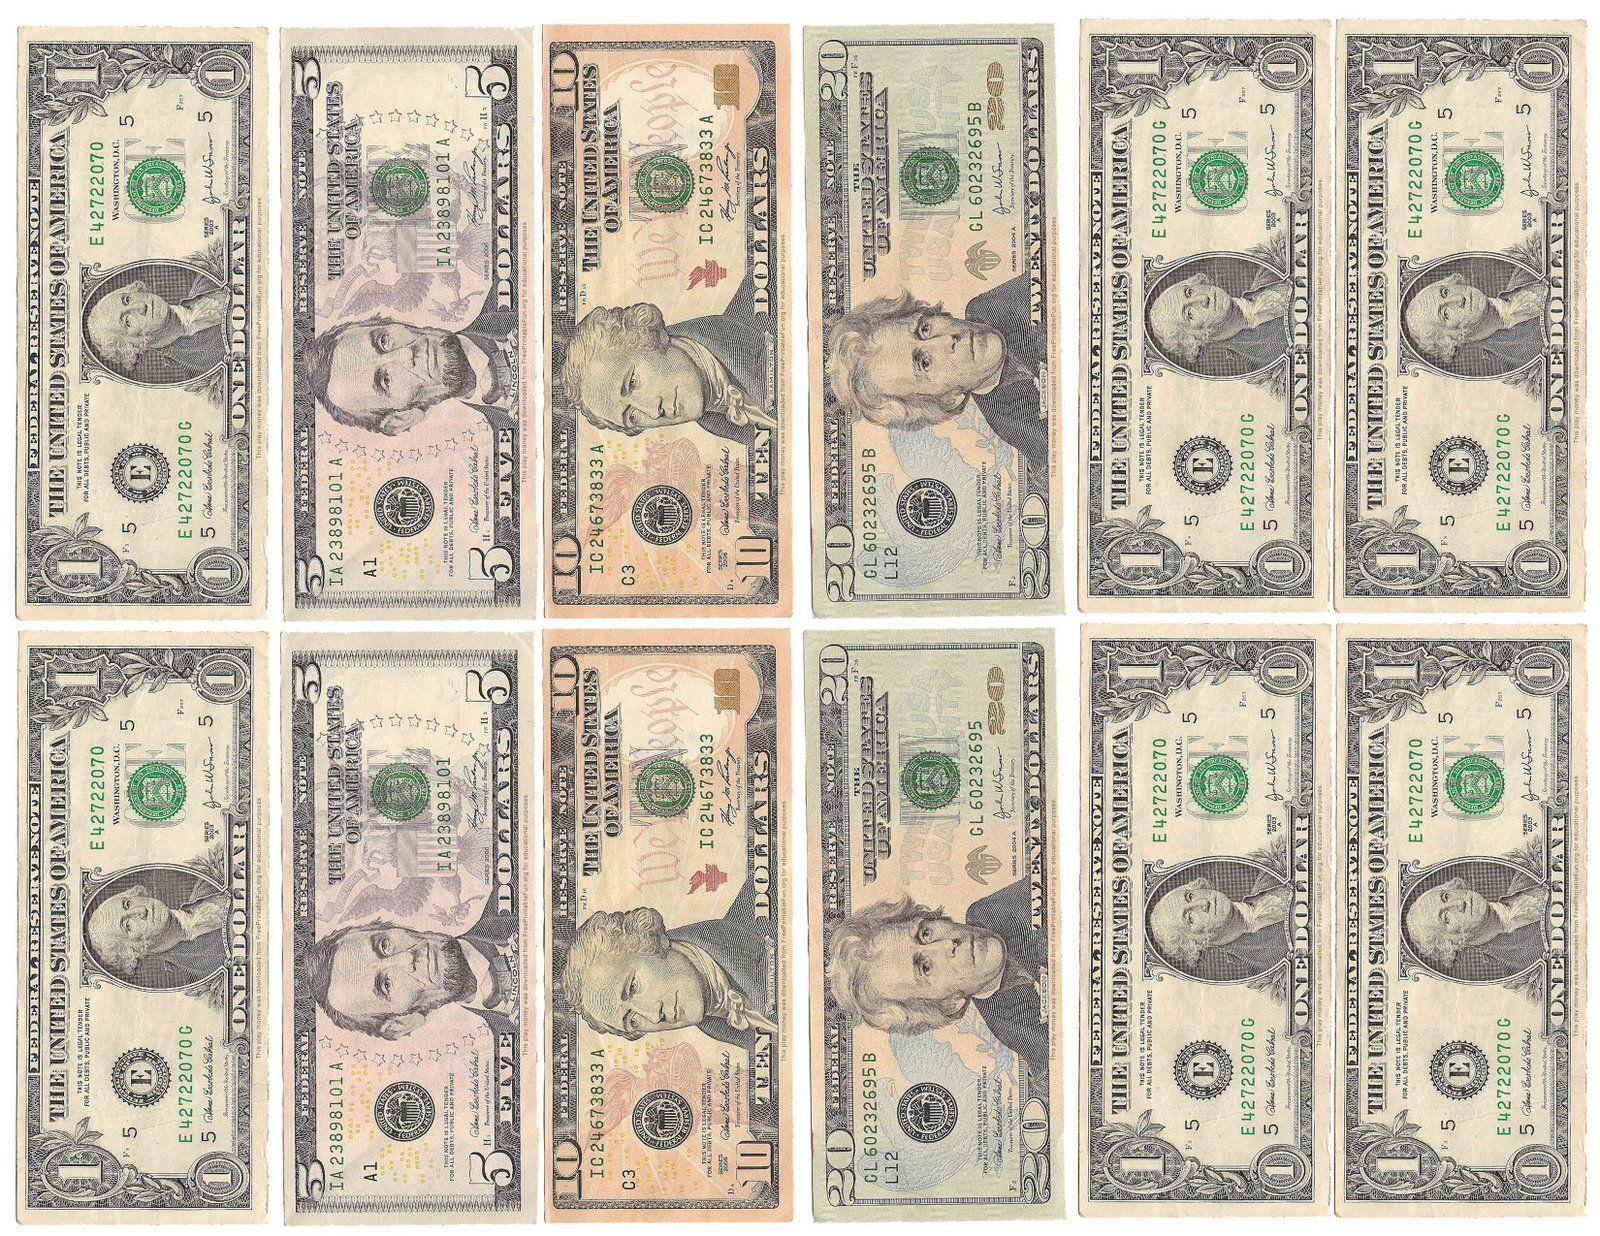 Money Money Money!   Kid's Room   Pinterest   Printable Play Money - Free Printable Fake Money That Looks Real